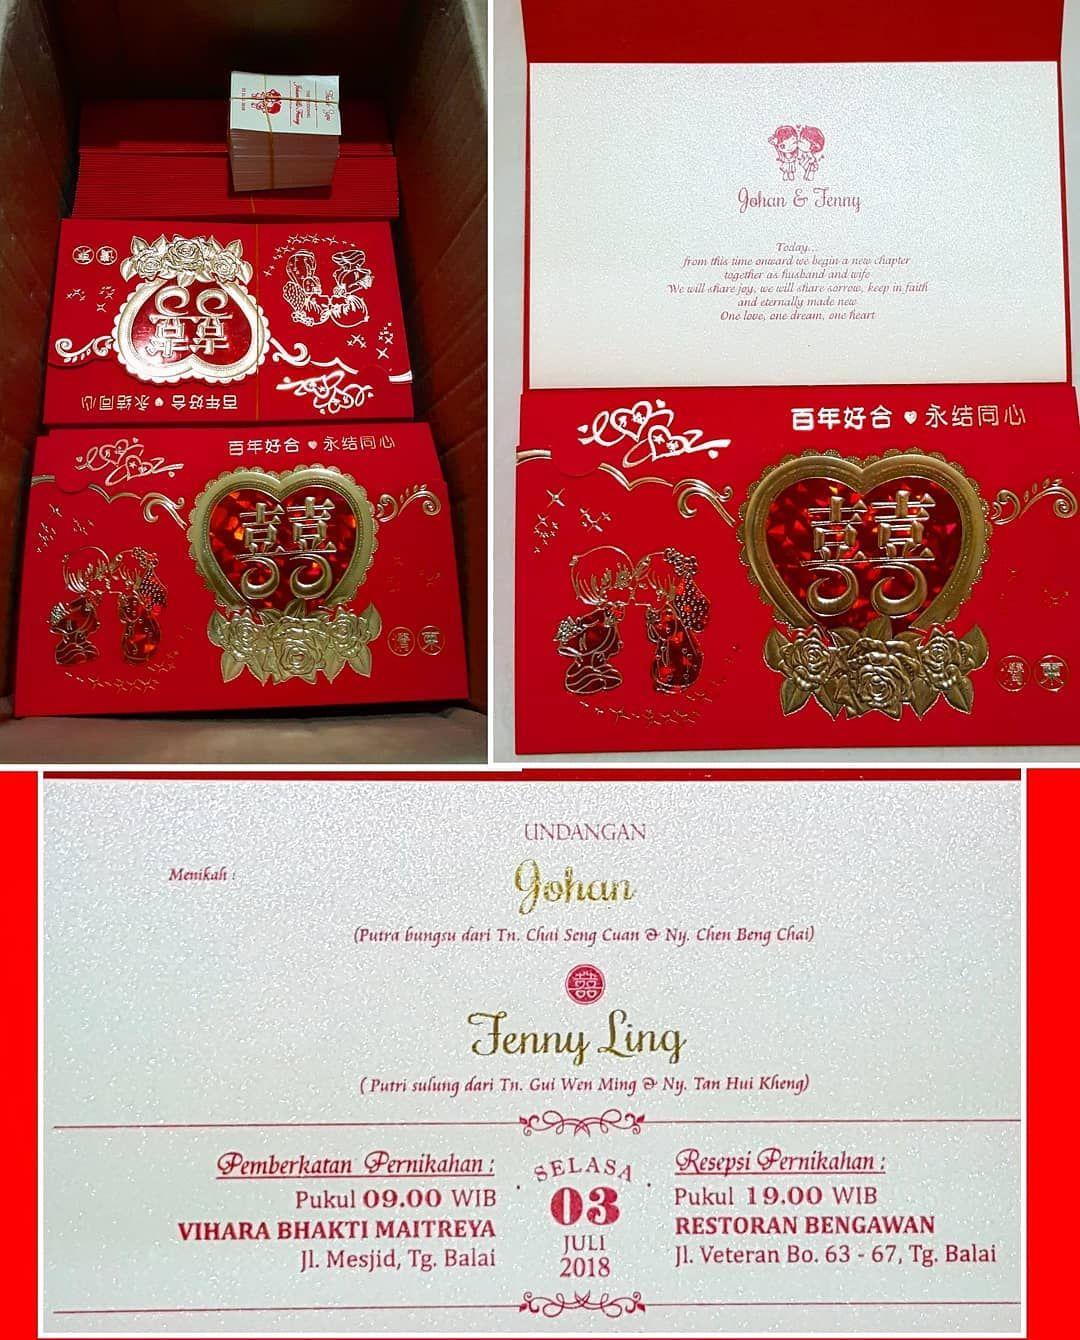 Wedding invitations done Happy Wedding Johan & Fenny Thankyou ...